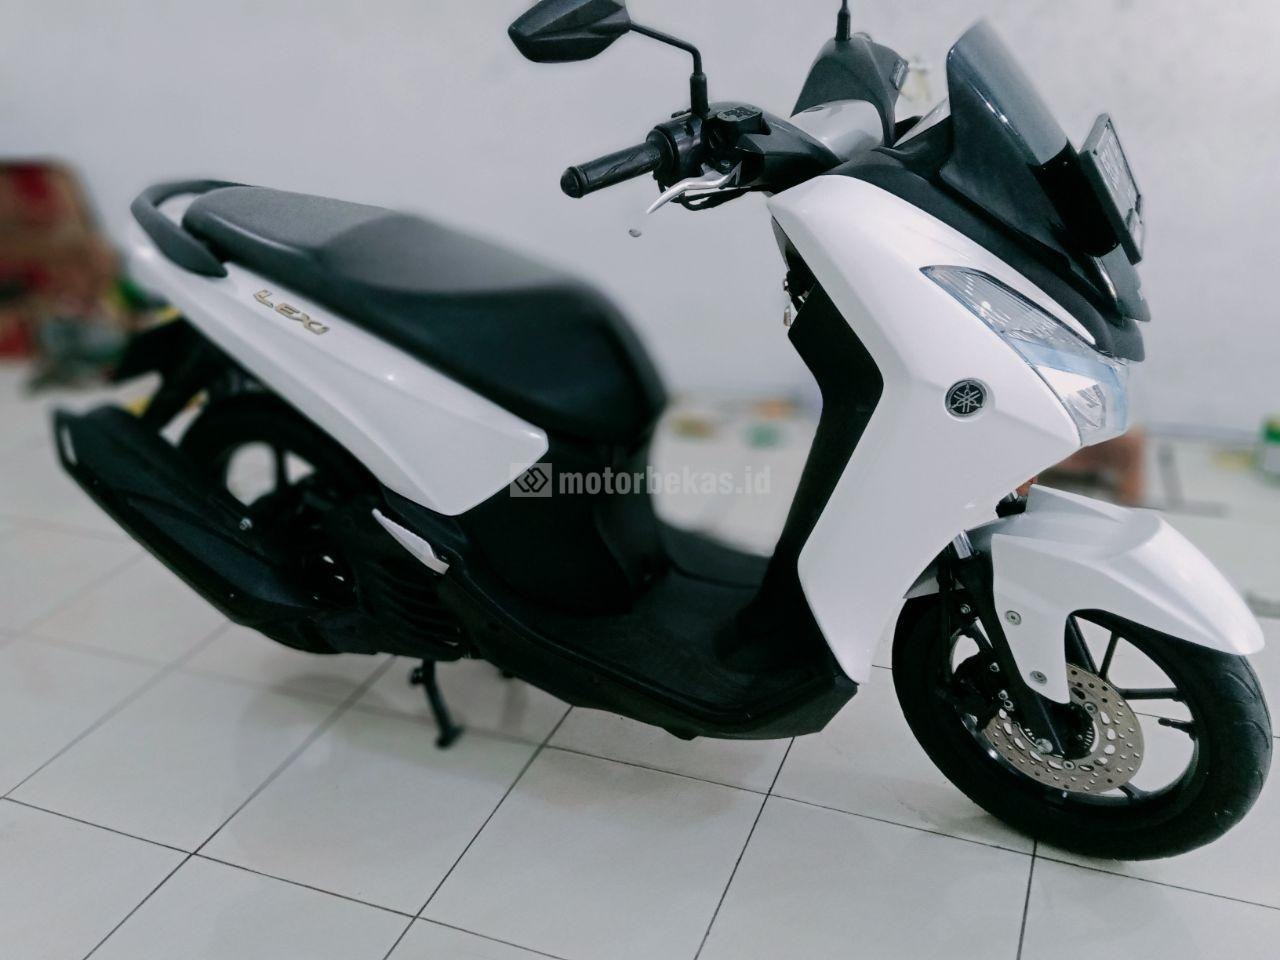 YAMAHA LEXI FI 954 motorbekas.id